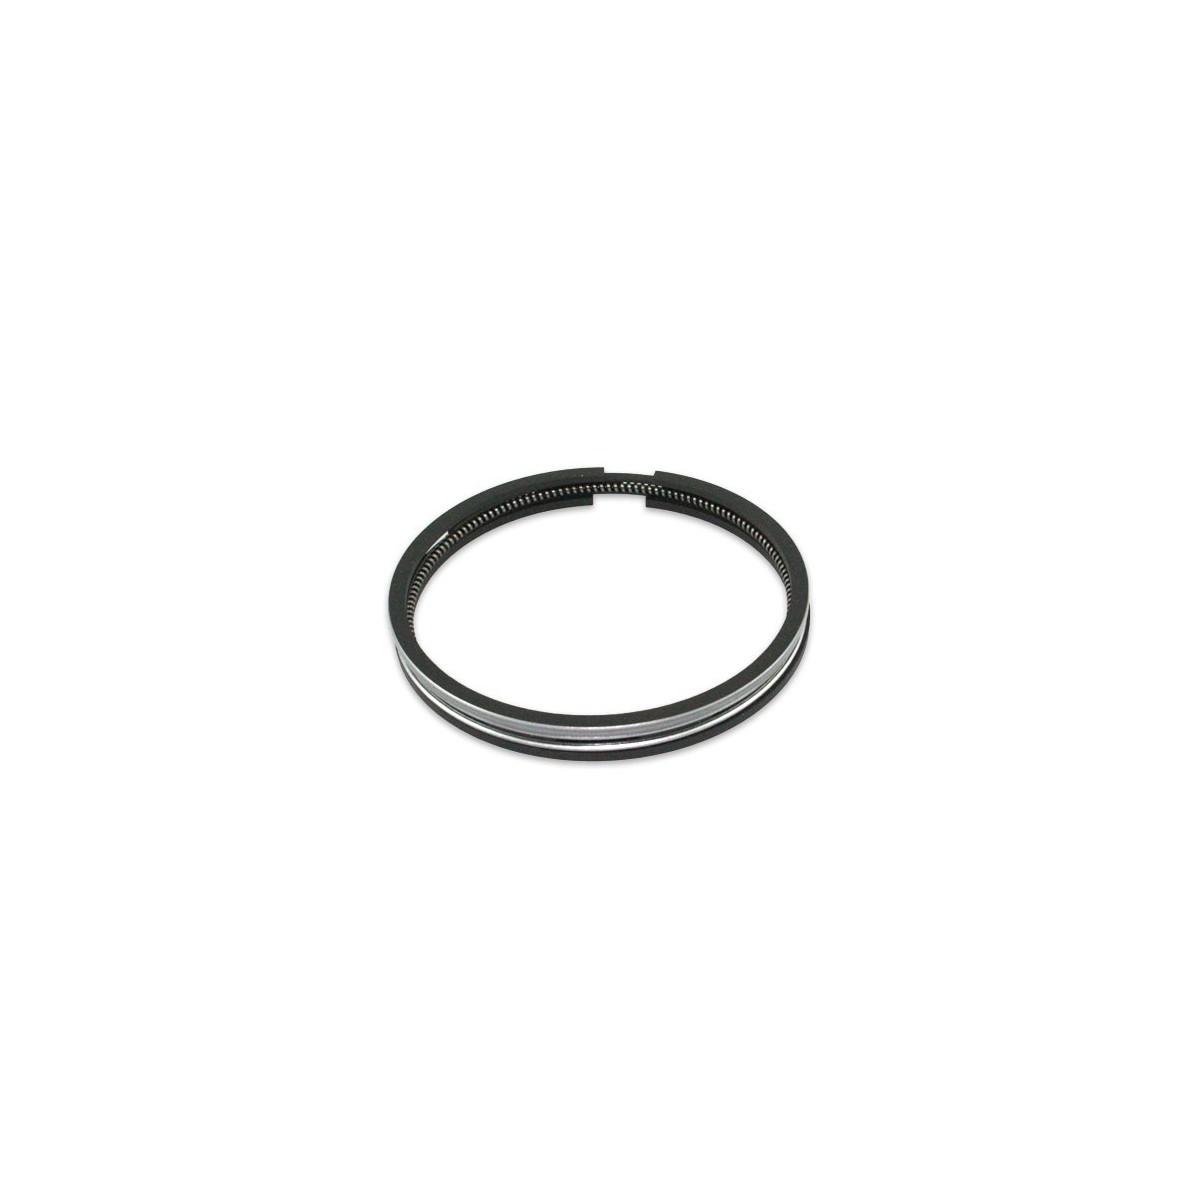 Kolbenringsatz Hinomoto E1804 75 : 2 x 2 x 4 (74) STD